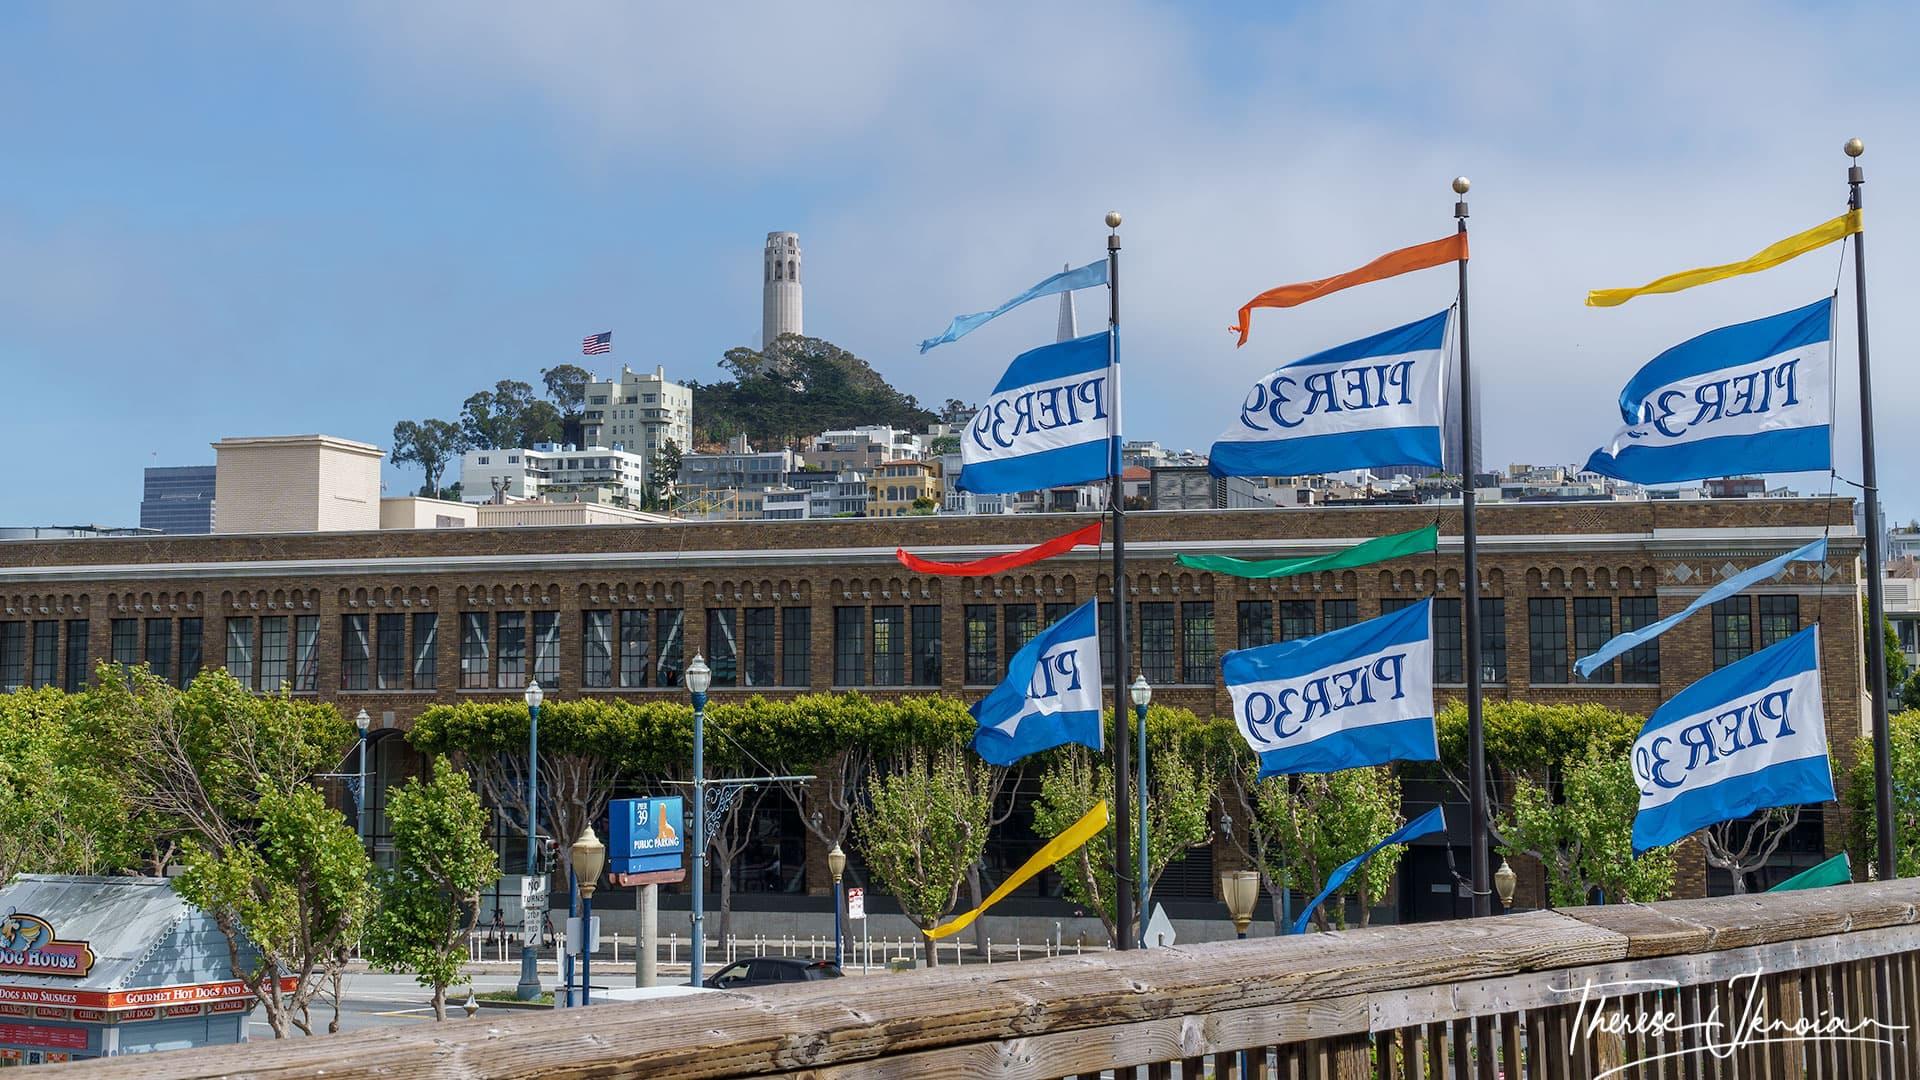 What To Do Pier 39 Restaurants Views